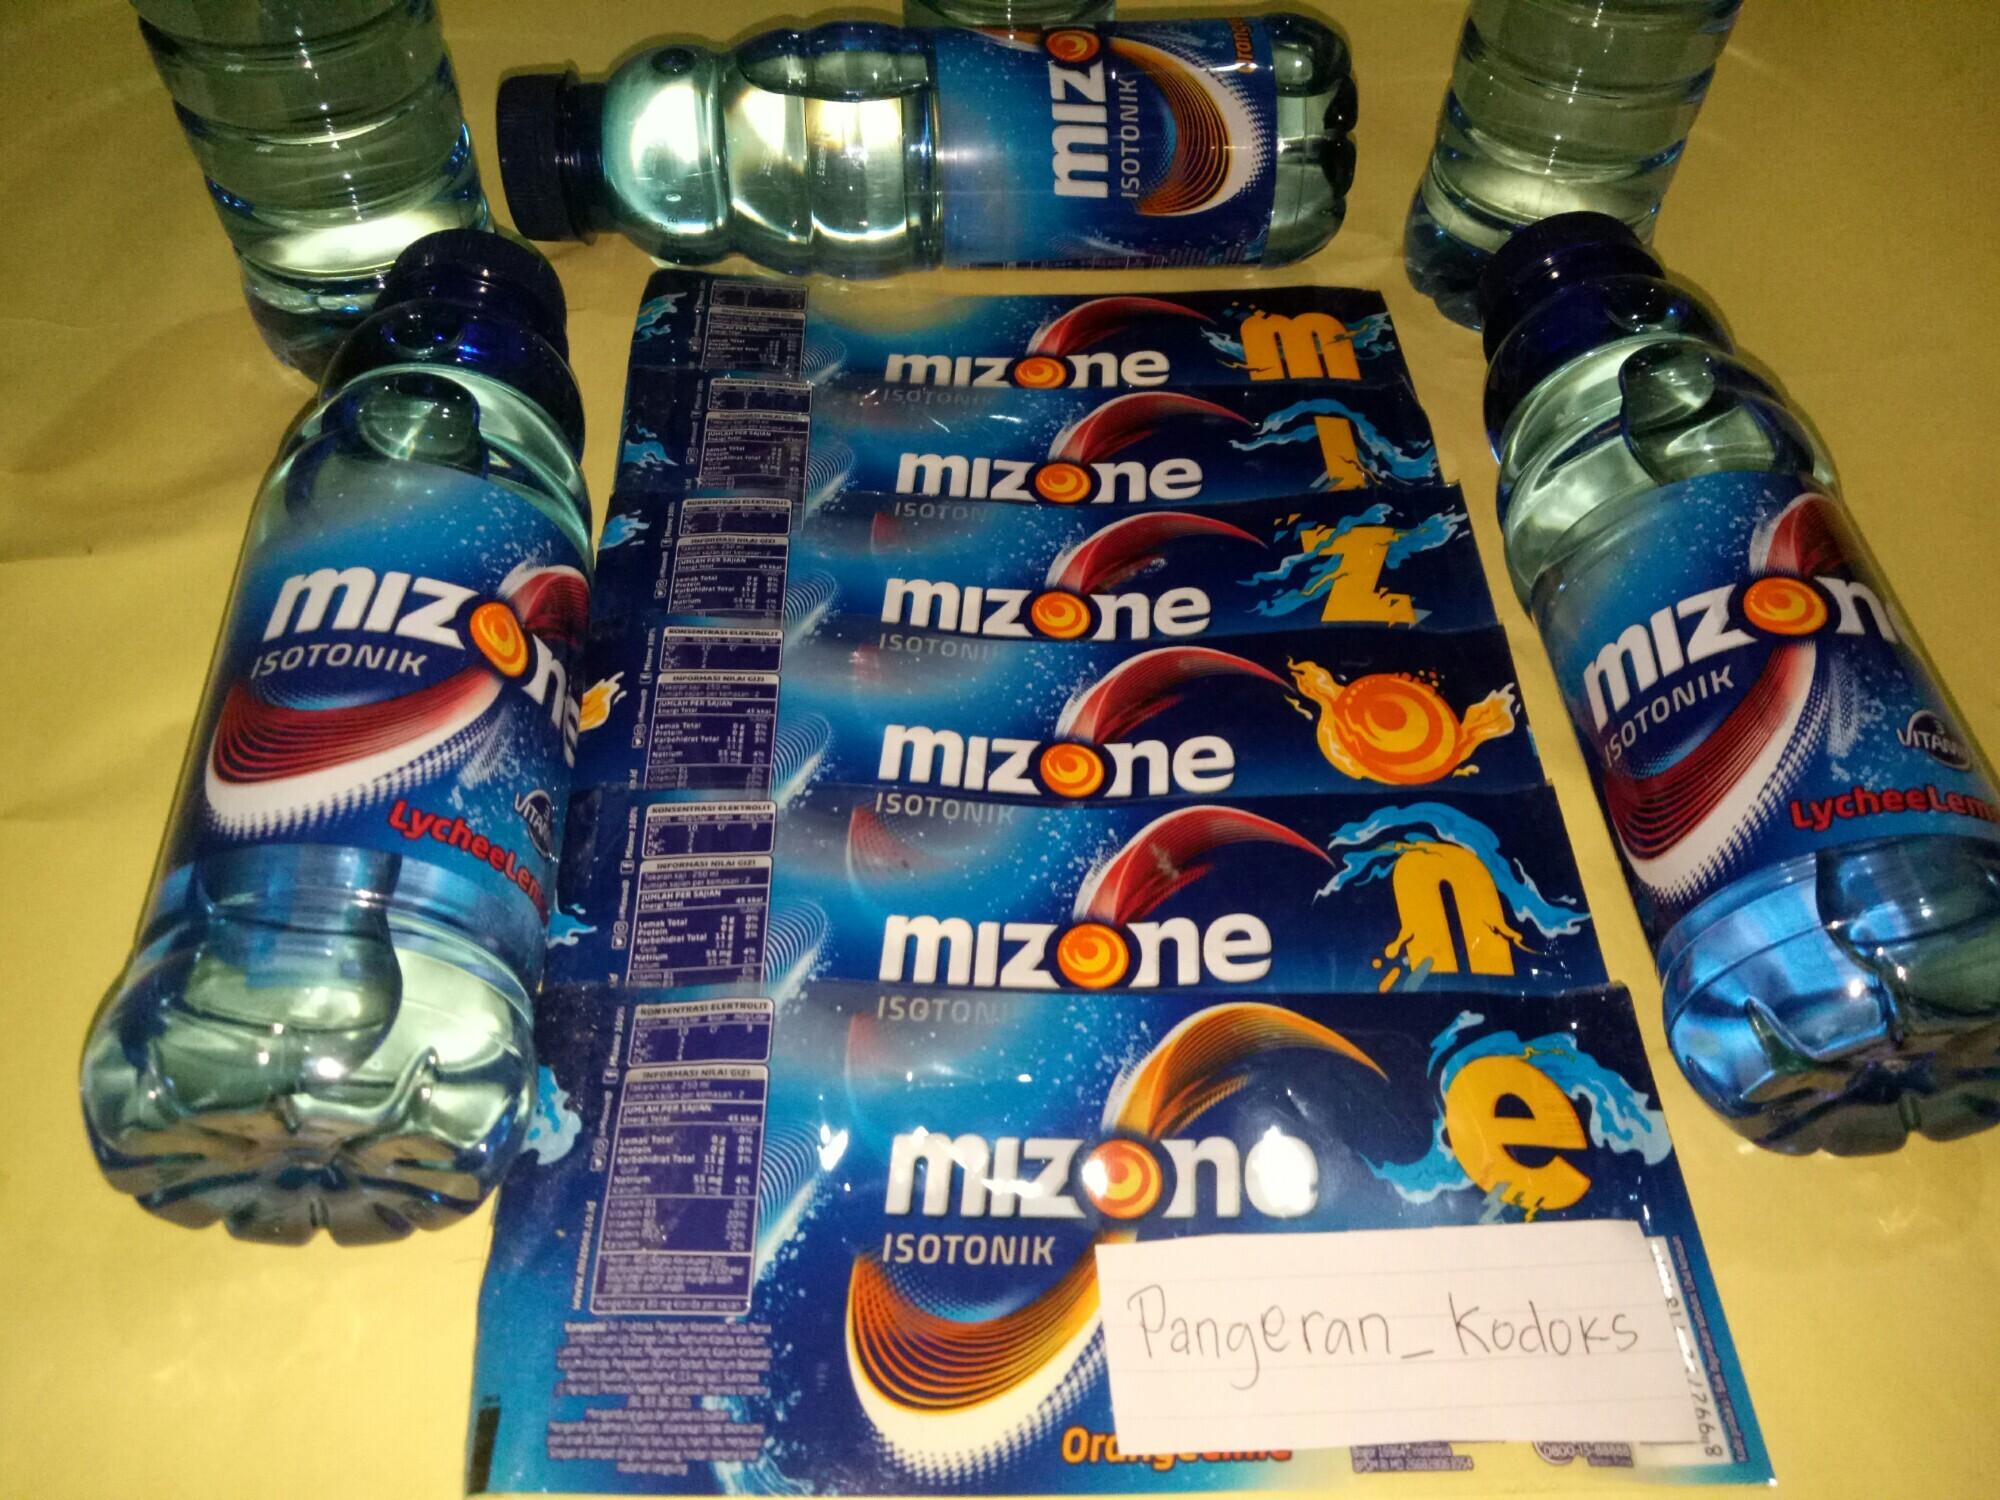 #KASKUSxMizone Mizone Banyak Varian Rasa